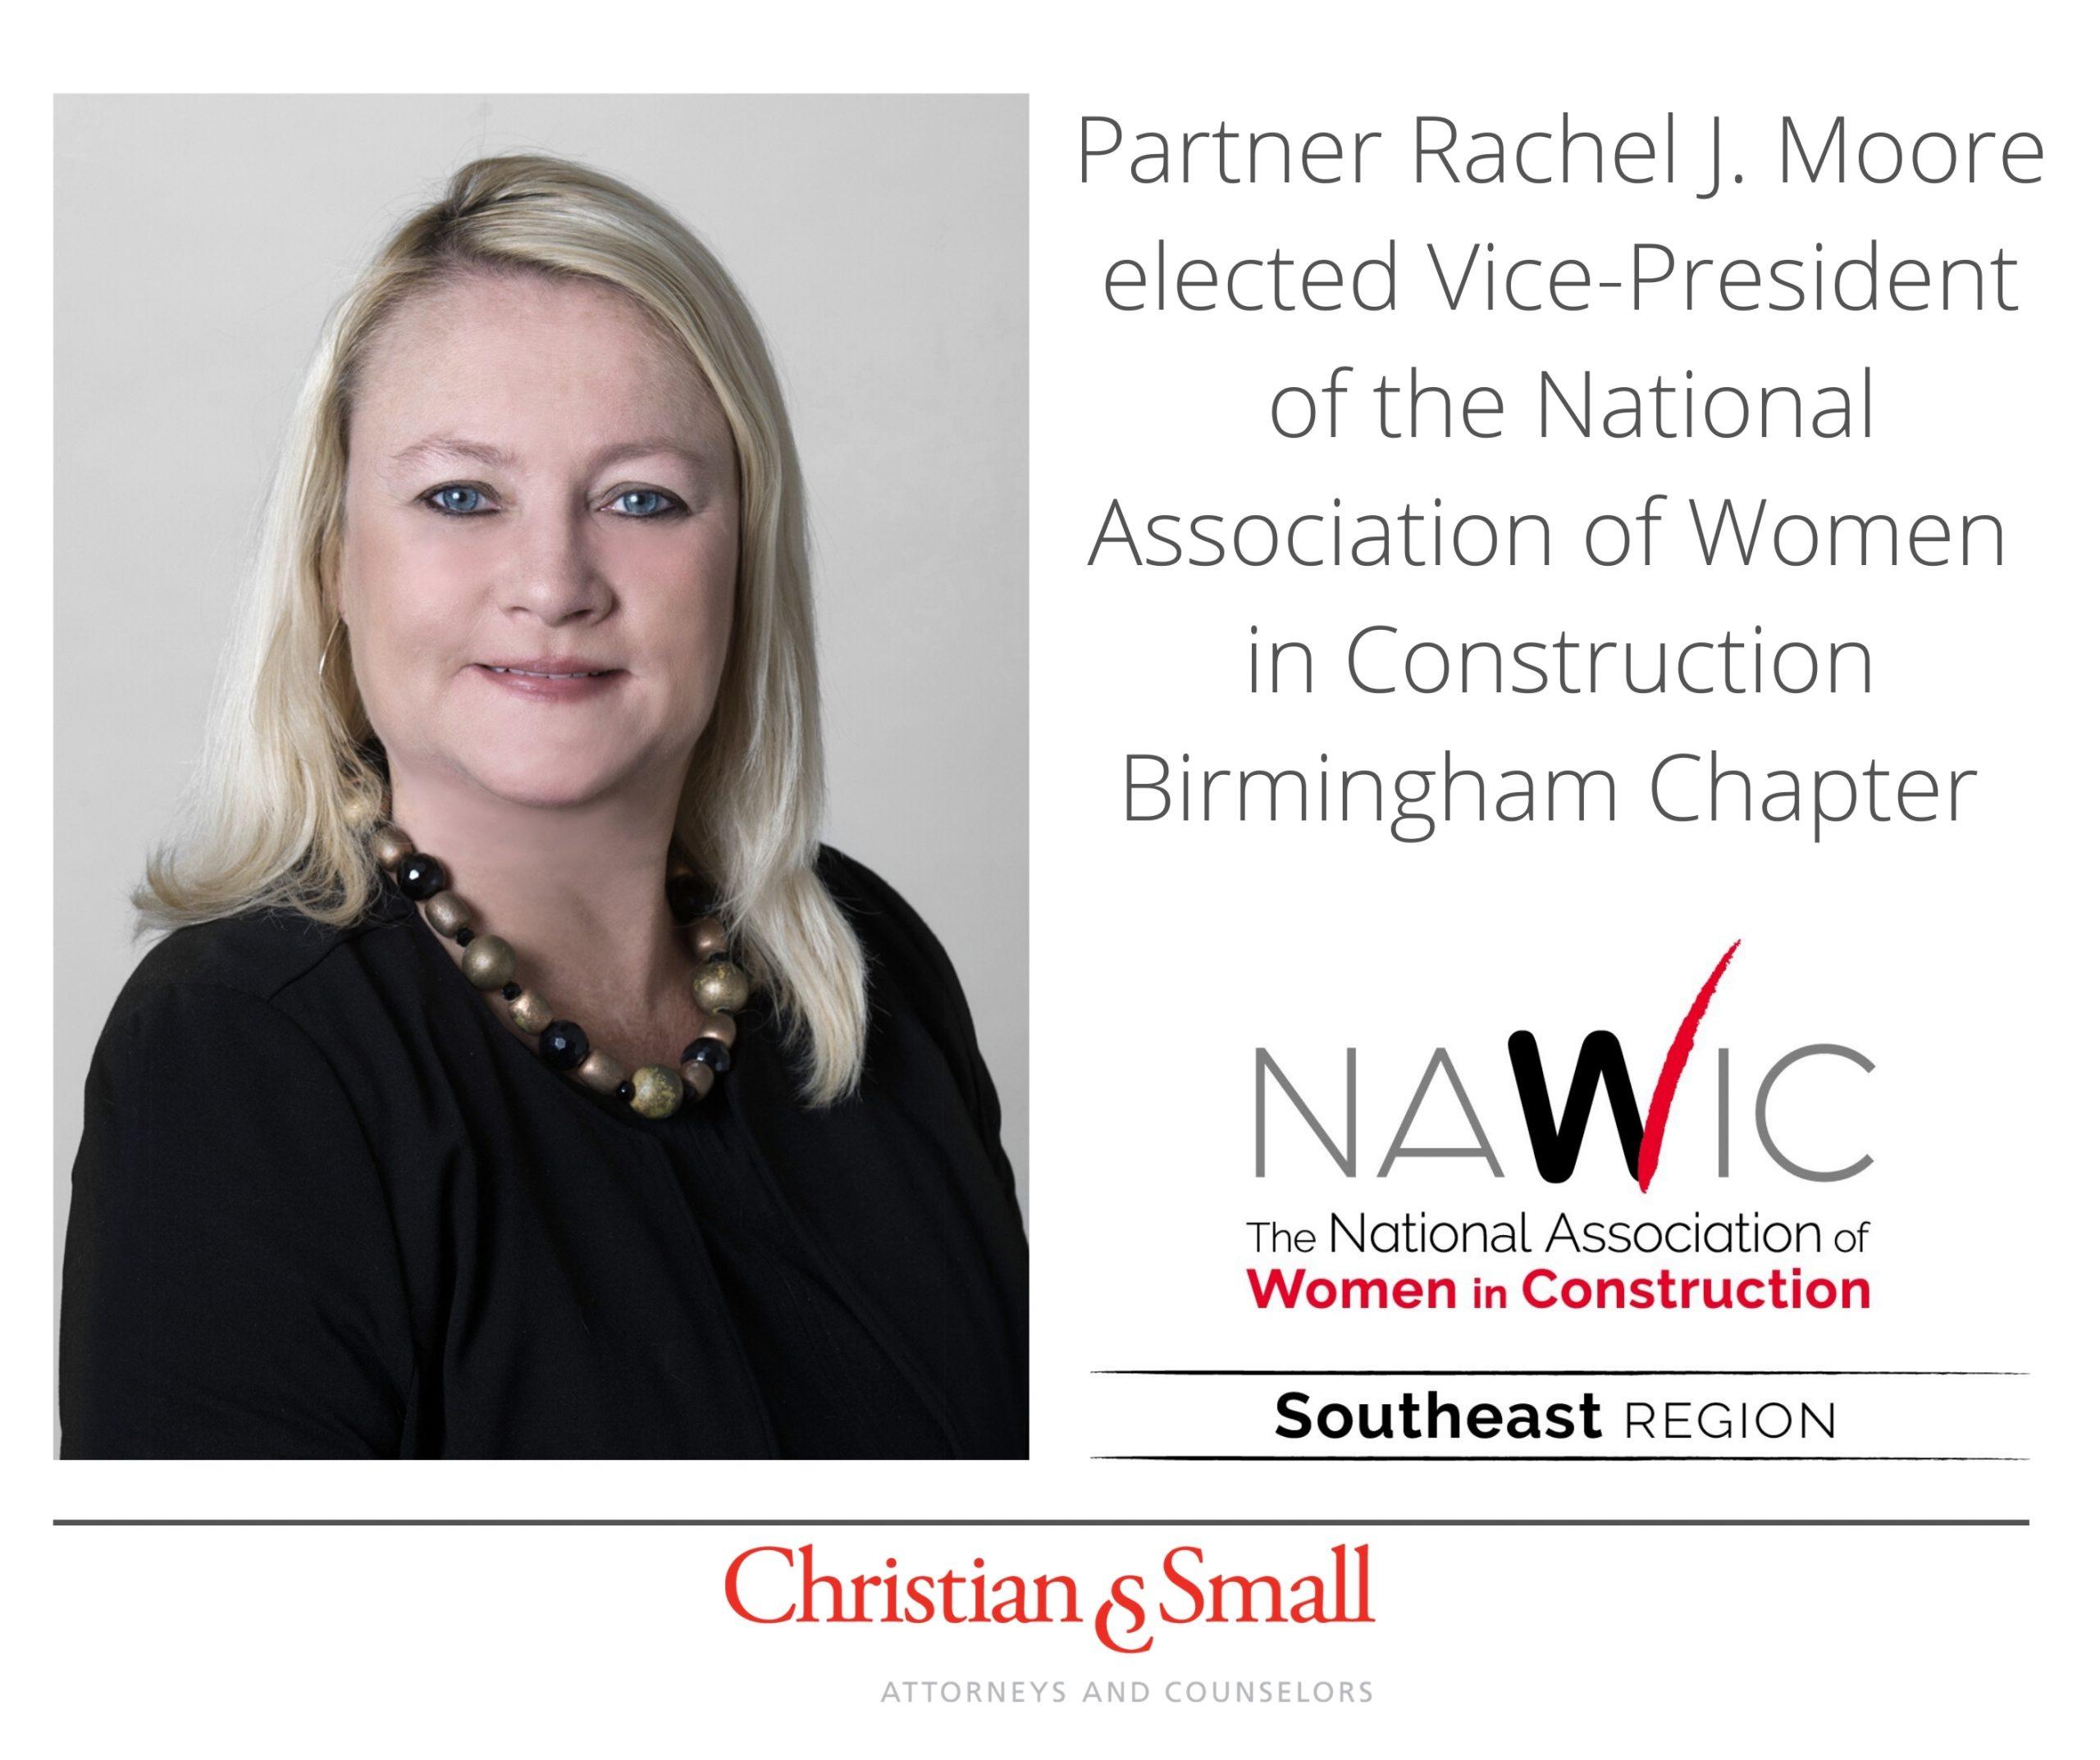 Christian & Small Partner Rachel J. Moore Elected Vice-President of Greater Birmingham NAWIC Chapter